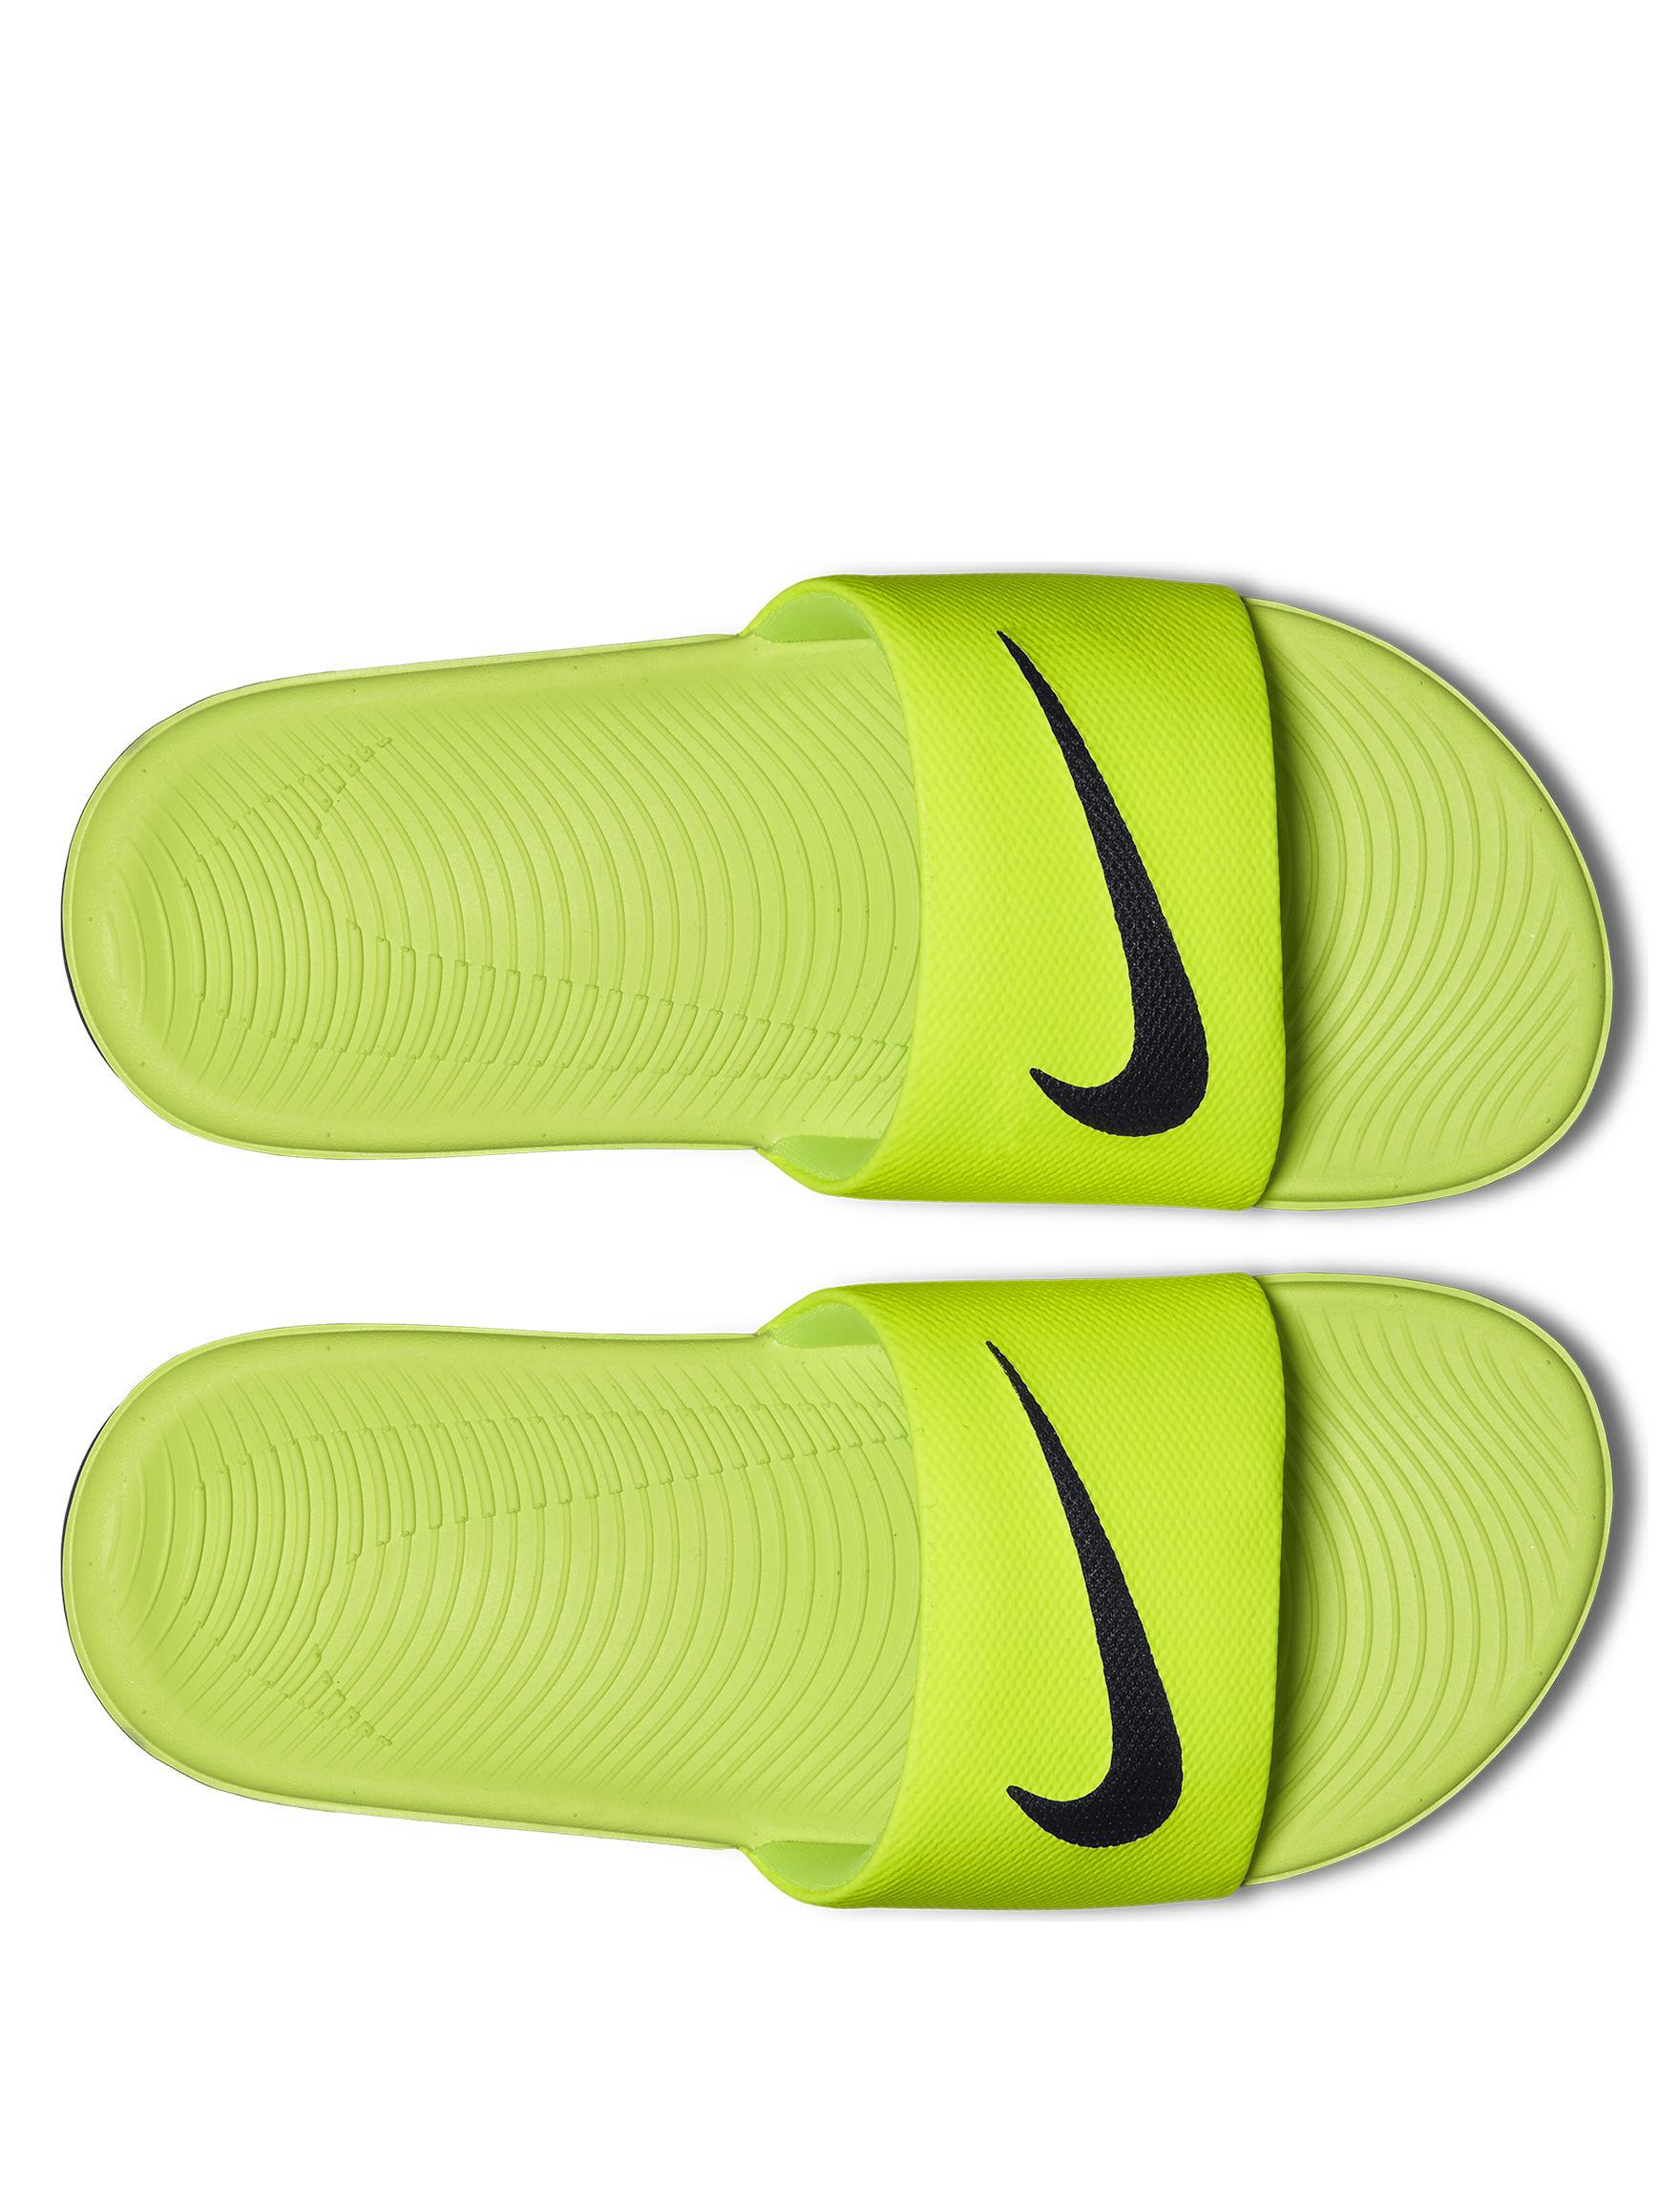 Nike Yellow / Black Flip Flops Slide Sandals